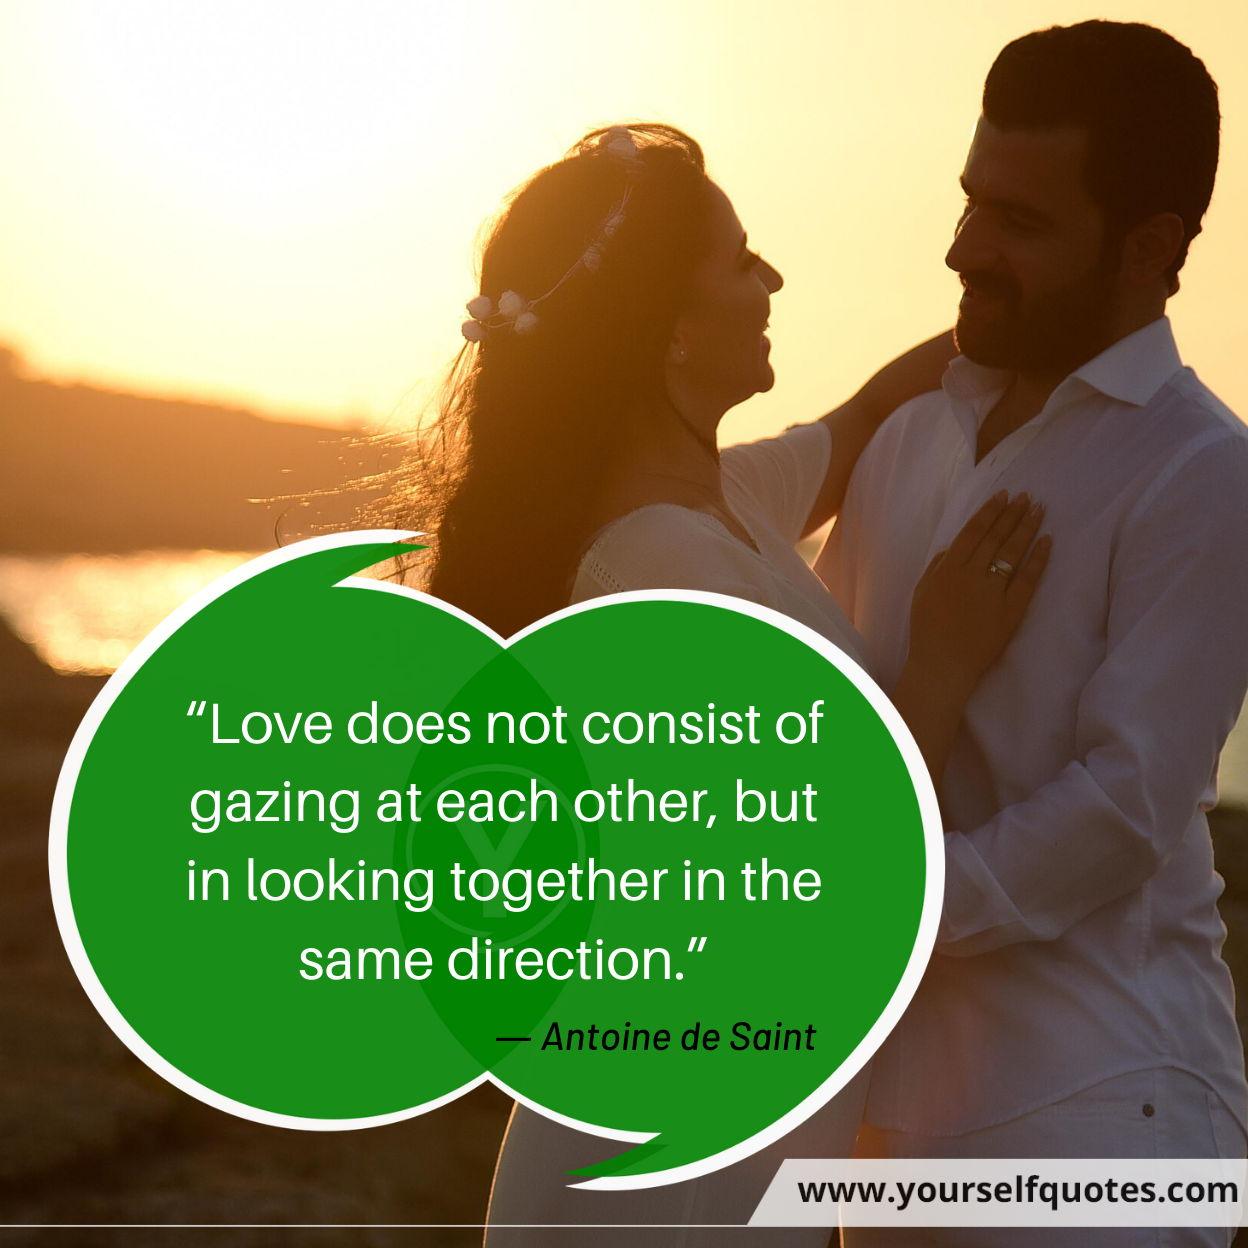 Quotes on Love by Antoine de Saint